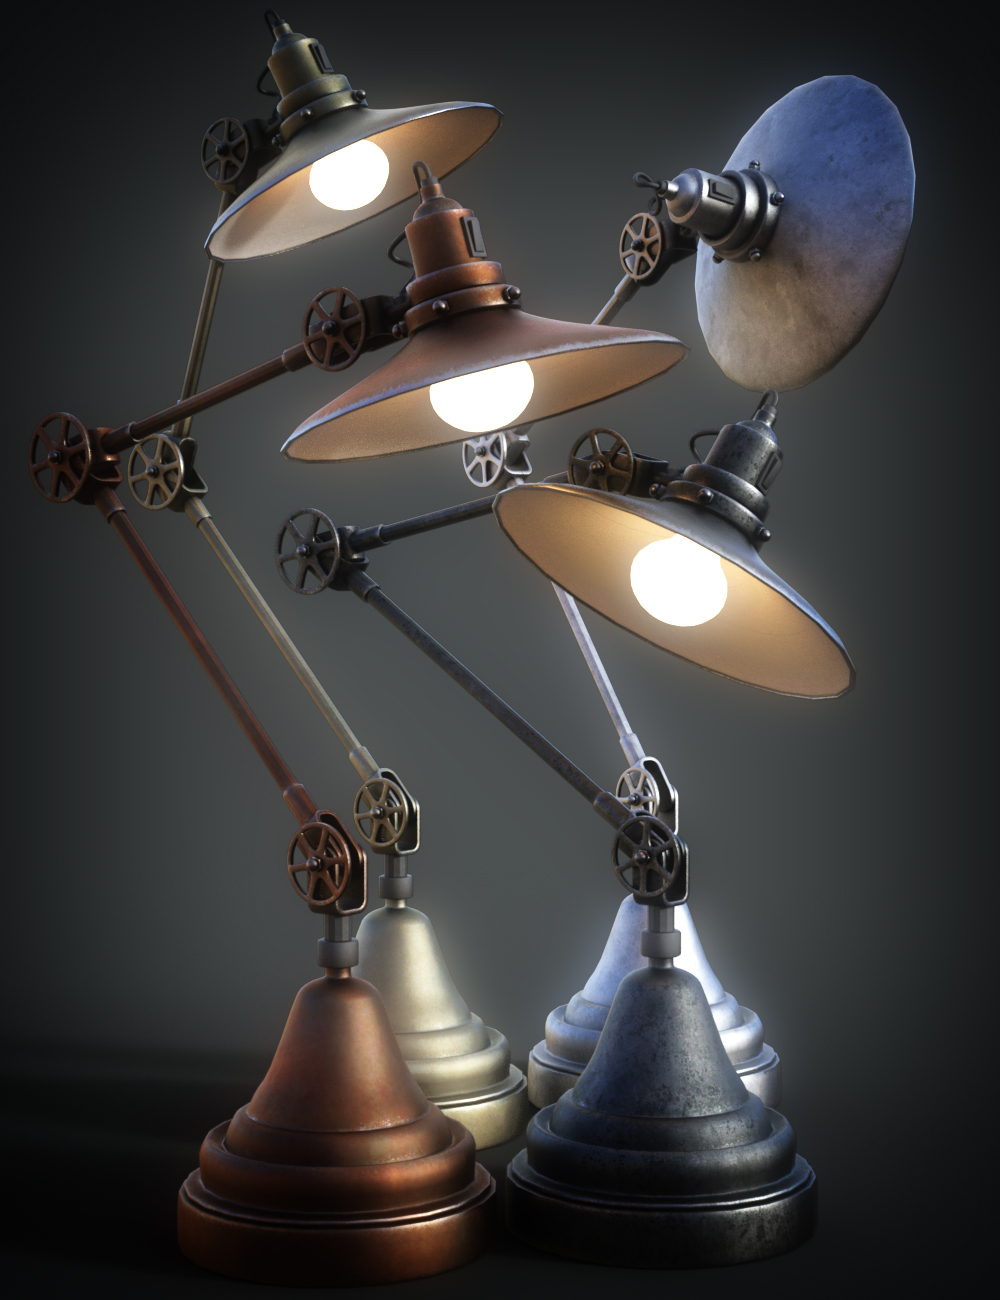 B.E.T.T.Y. Adjustable Desk Lamps by: B.E.T.T.Y, 3D Models by Daz 3D